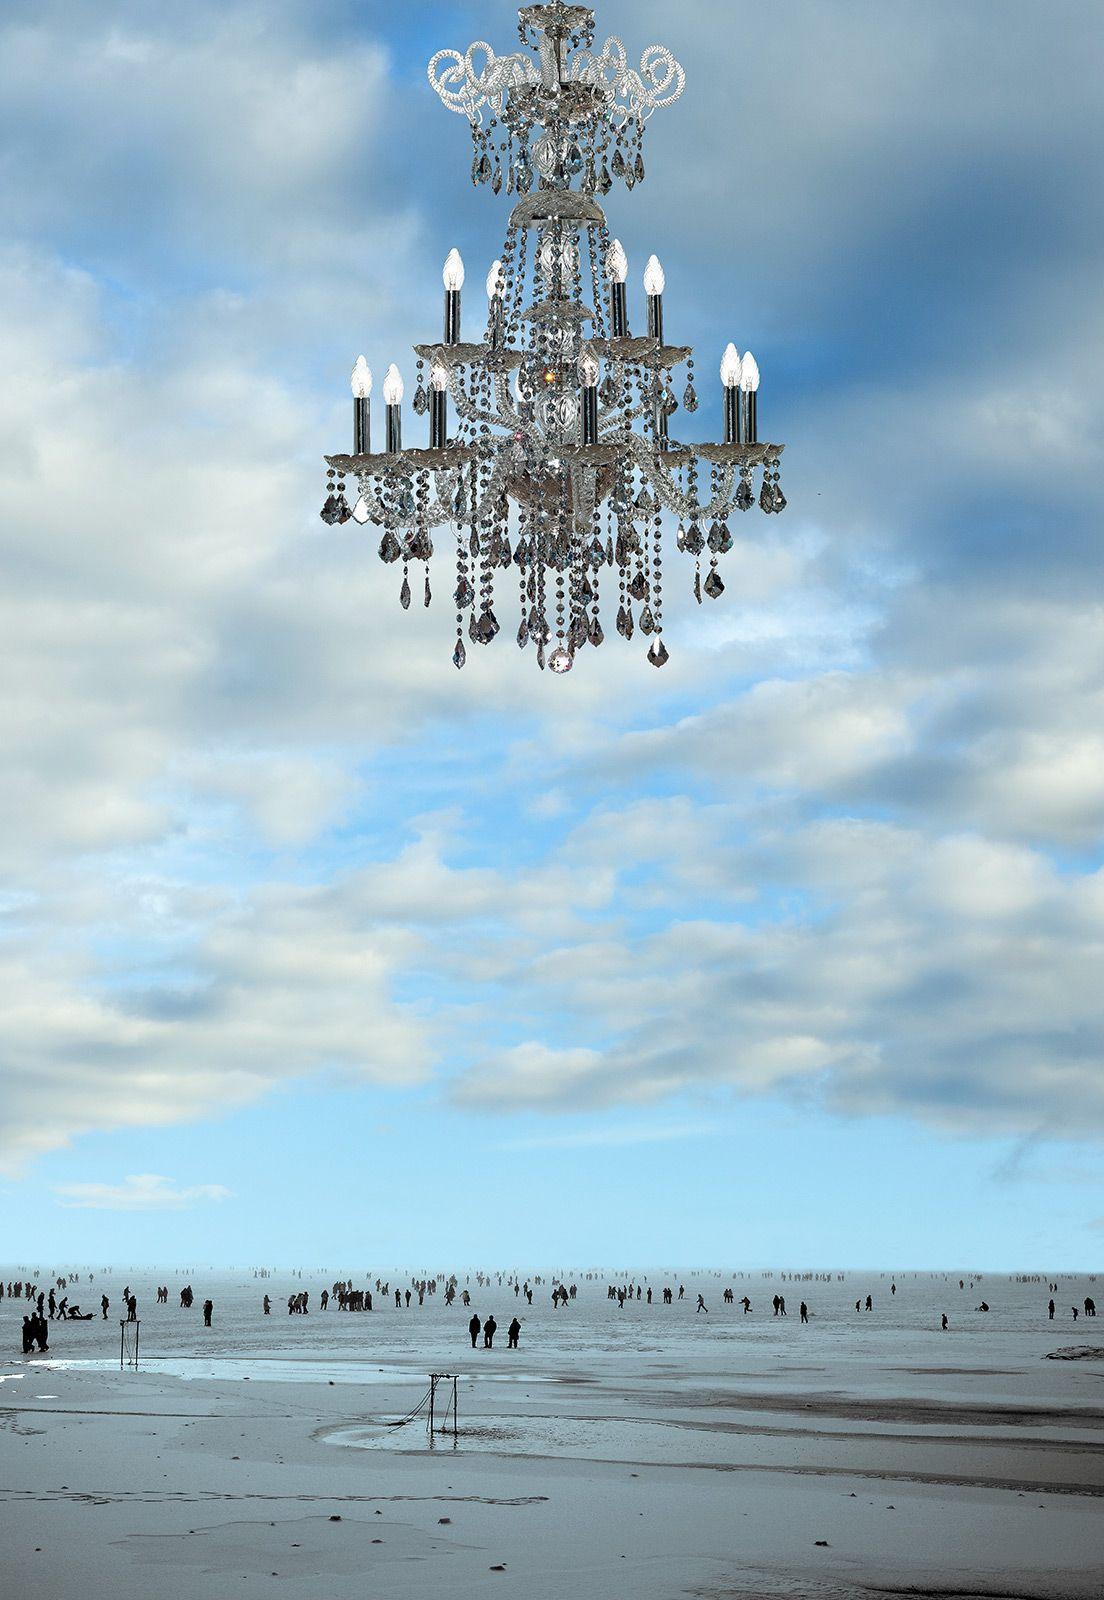 Fotokunst Kaufen fotokunst kaufen lumas surealisme